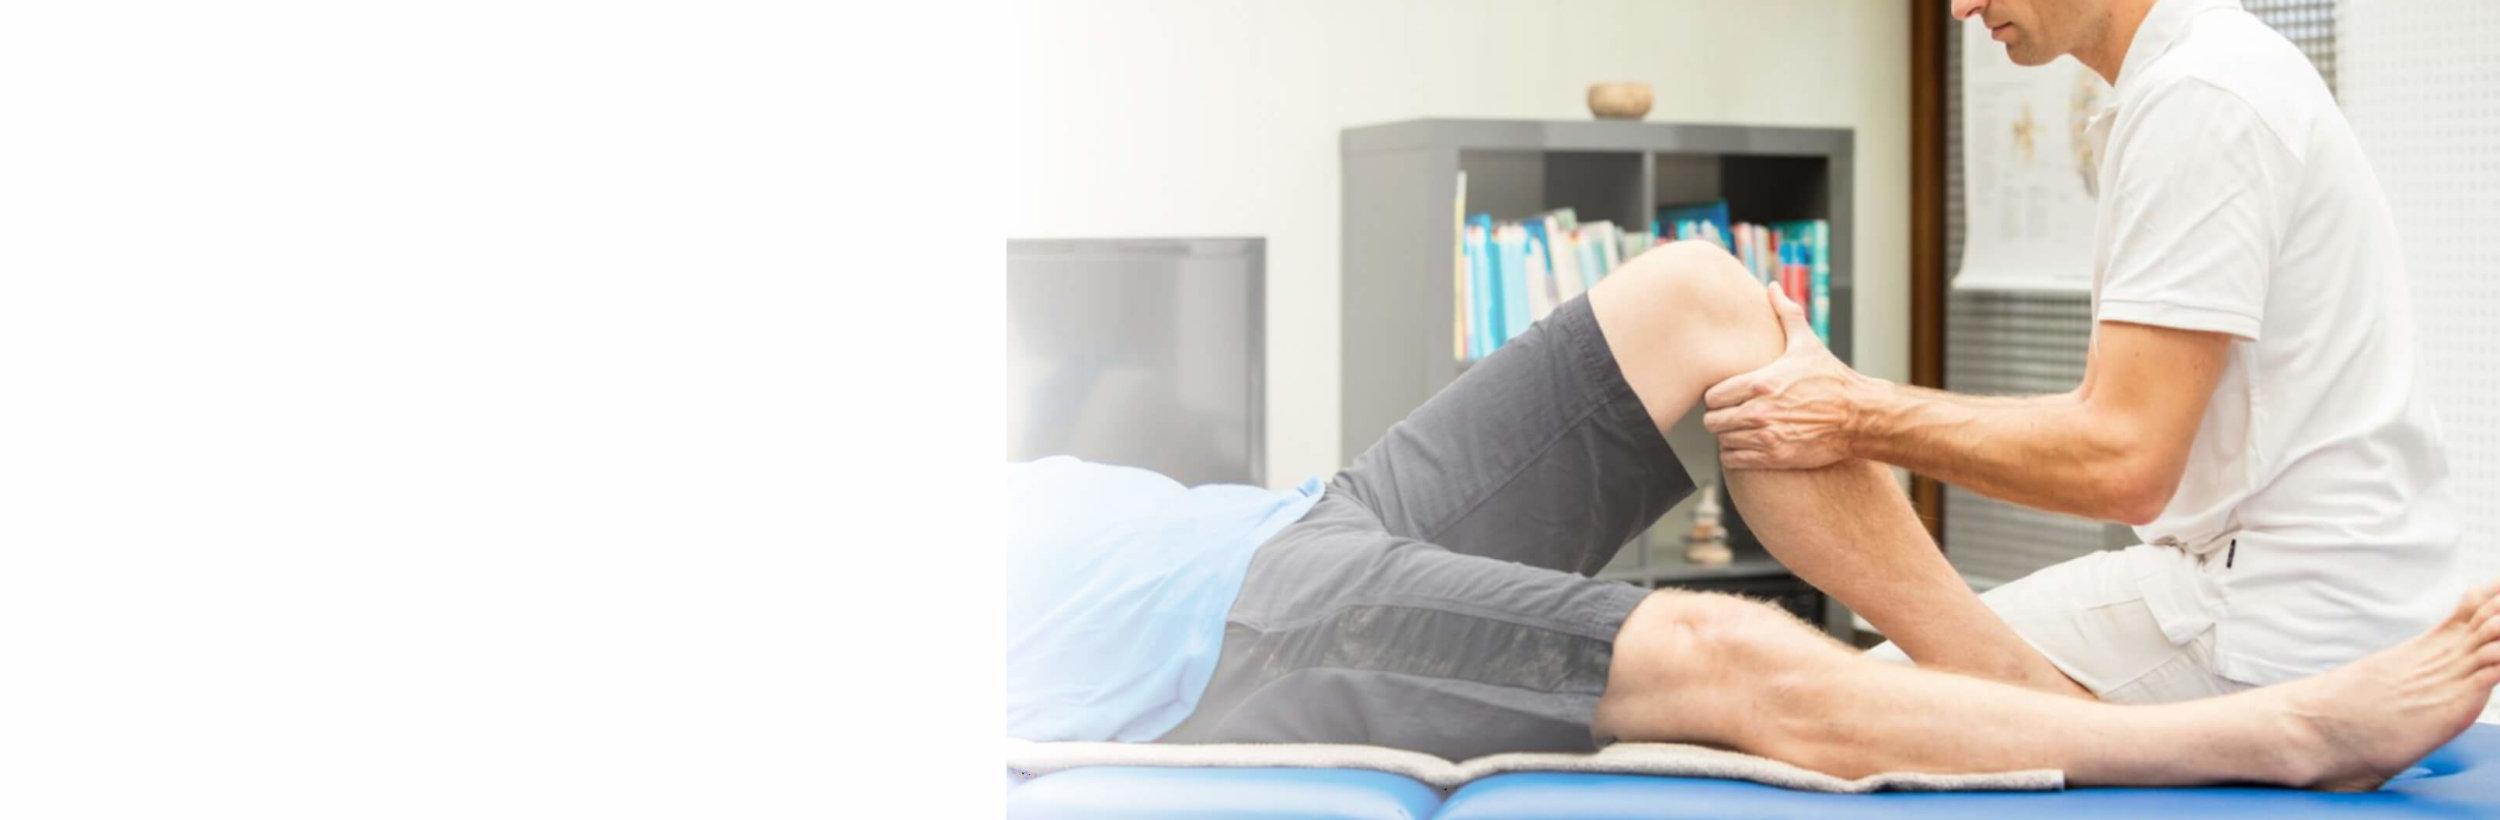 physiotherapist manipulating knee